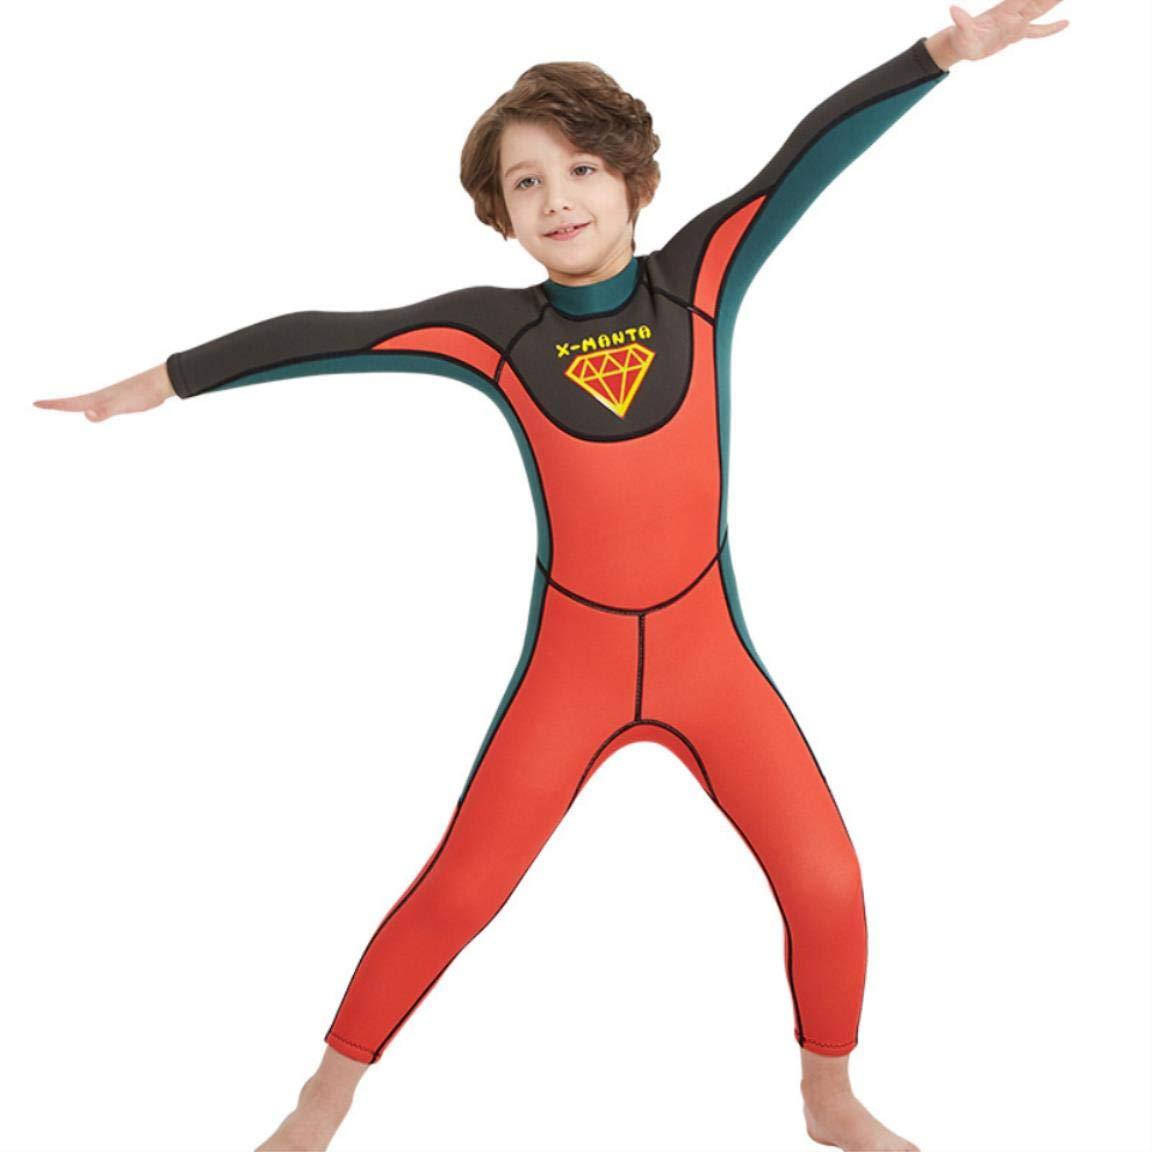 ArmyGreenorangered Small 2.5mm Wetsuitsimaese boy Diving Suit Long Sleeve Sunscreen Jellyfish Clothing Swimwear